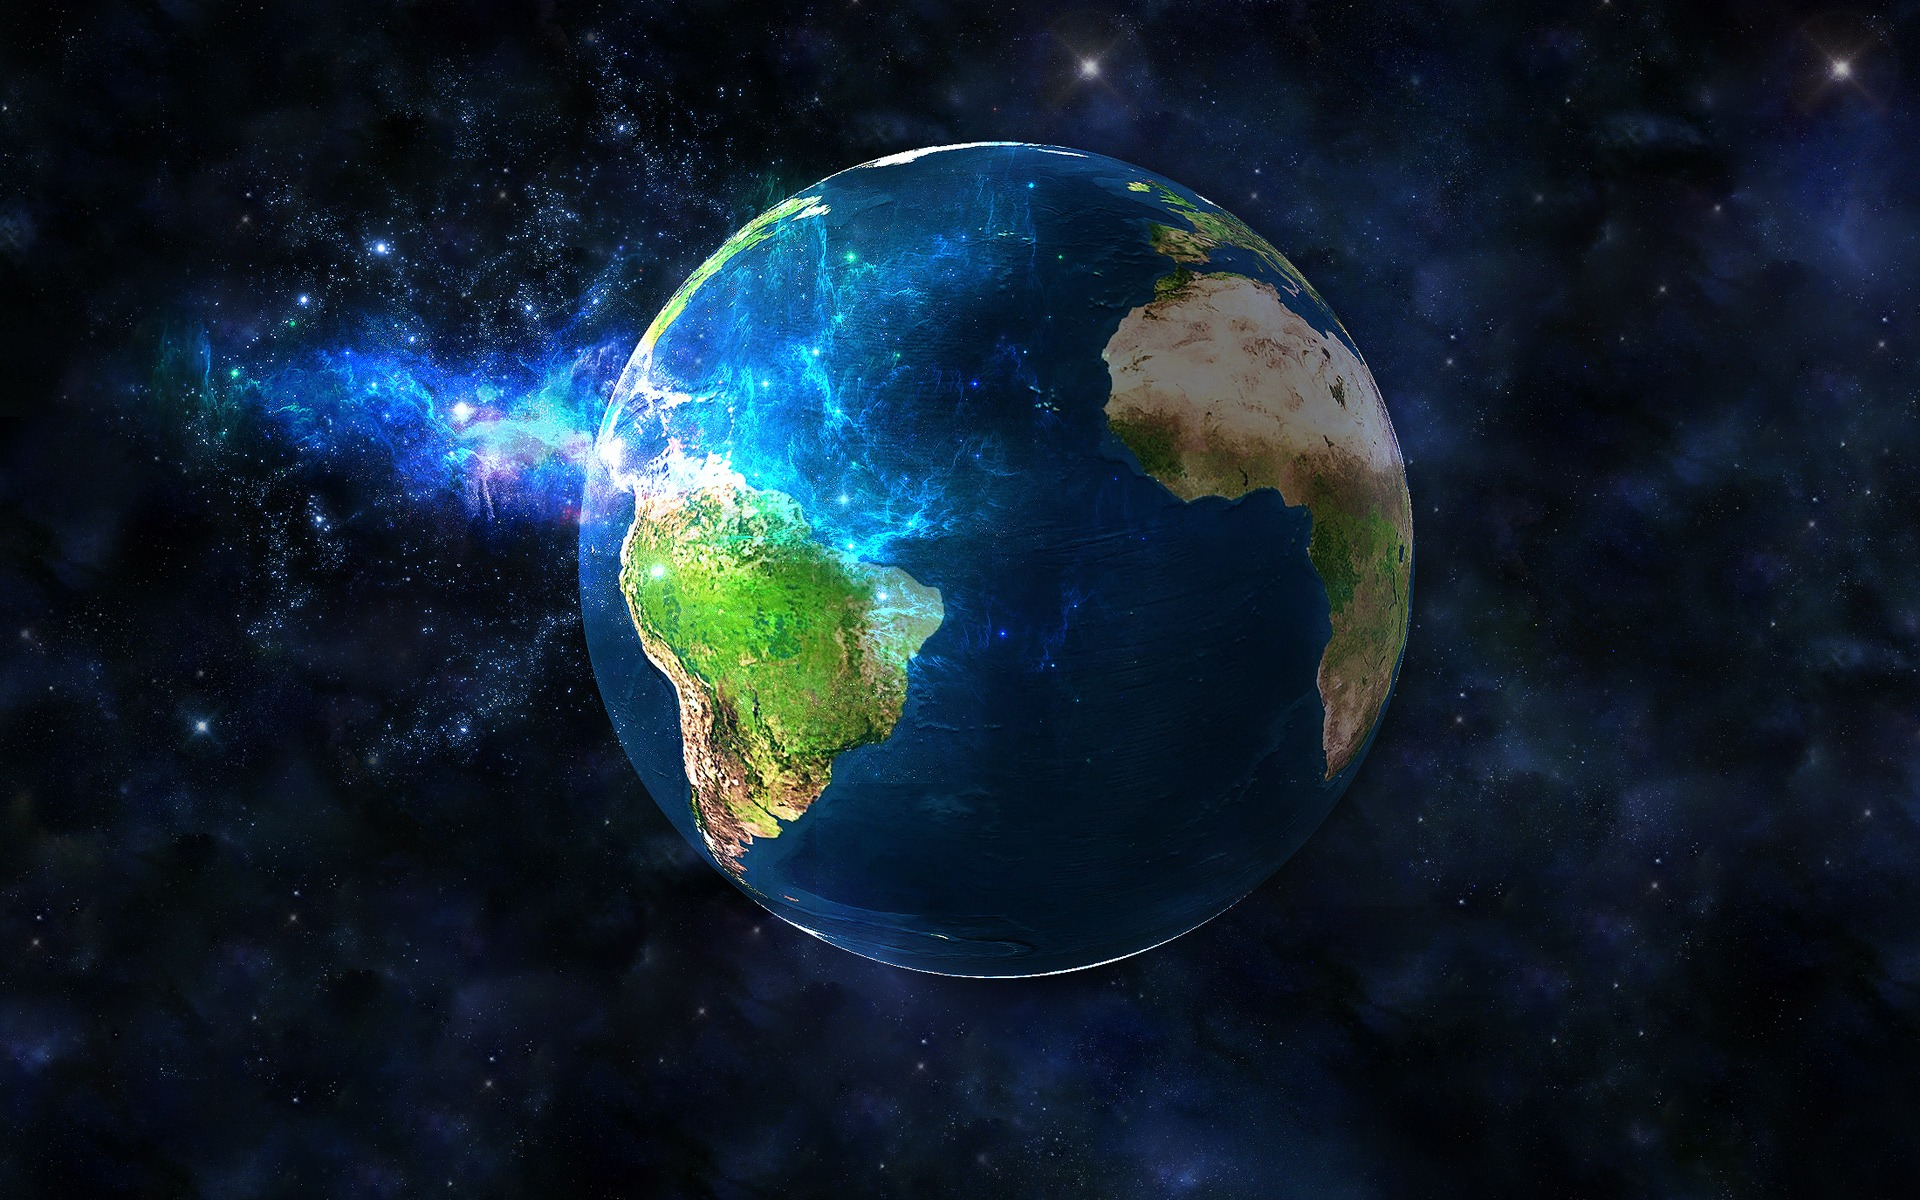 Planet Digital Art Space Planets Digital Art